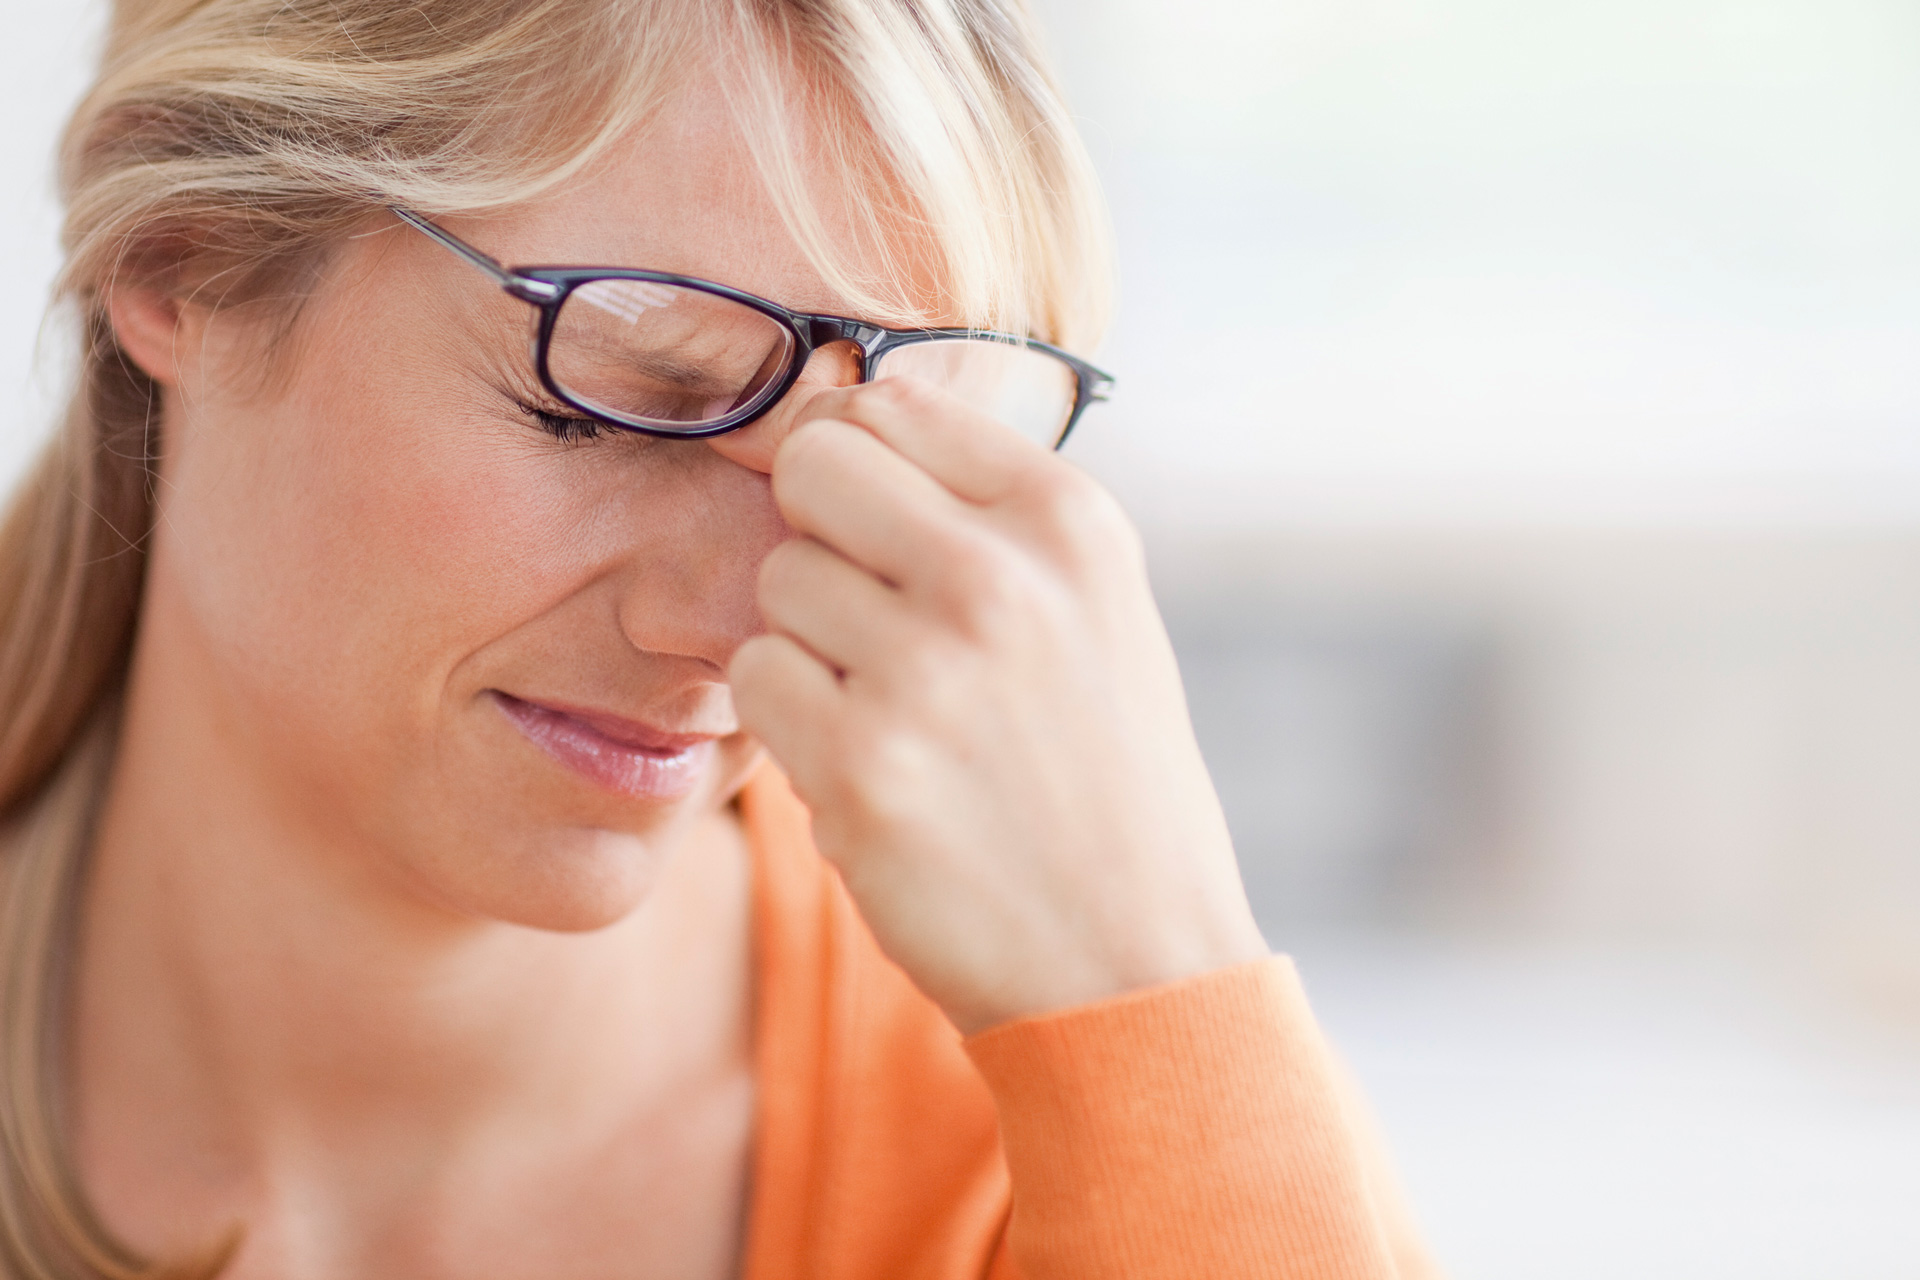 Vedere slabă și amețeli